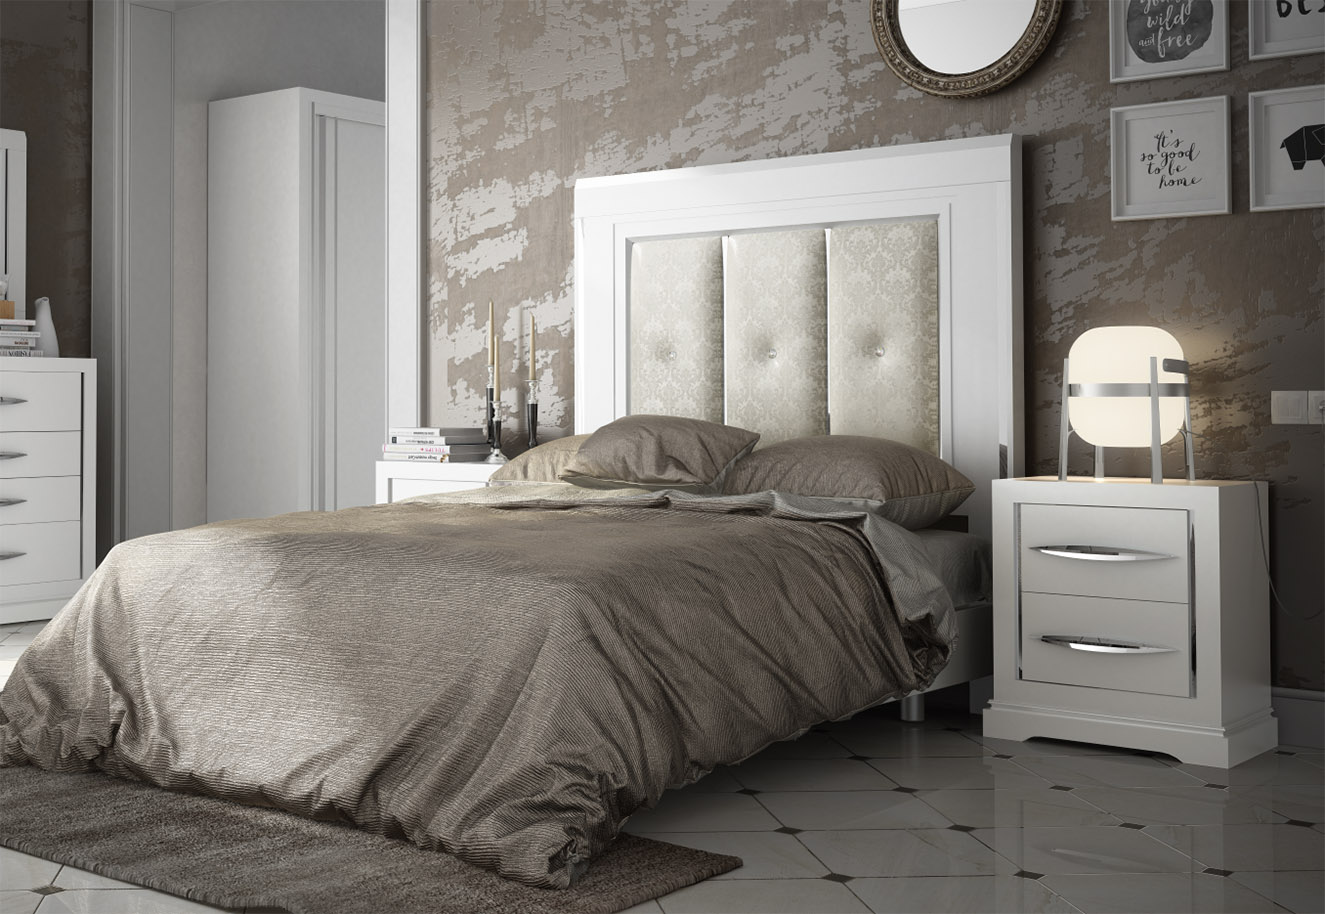 Muebles lvarez baixo mi o dormitorio decco white for Muebles alvarez